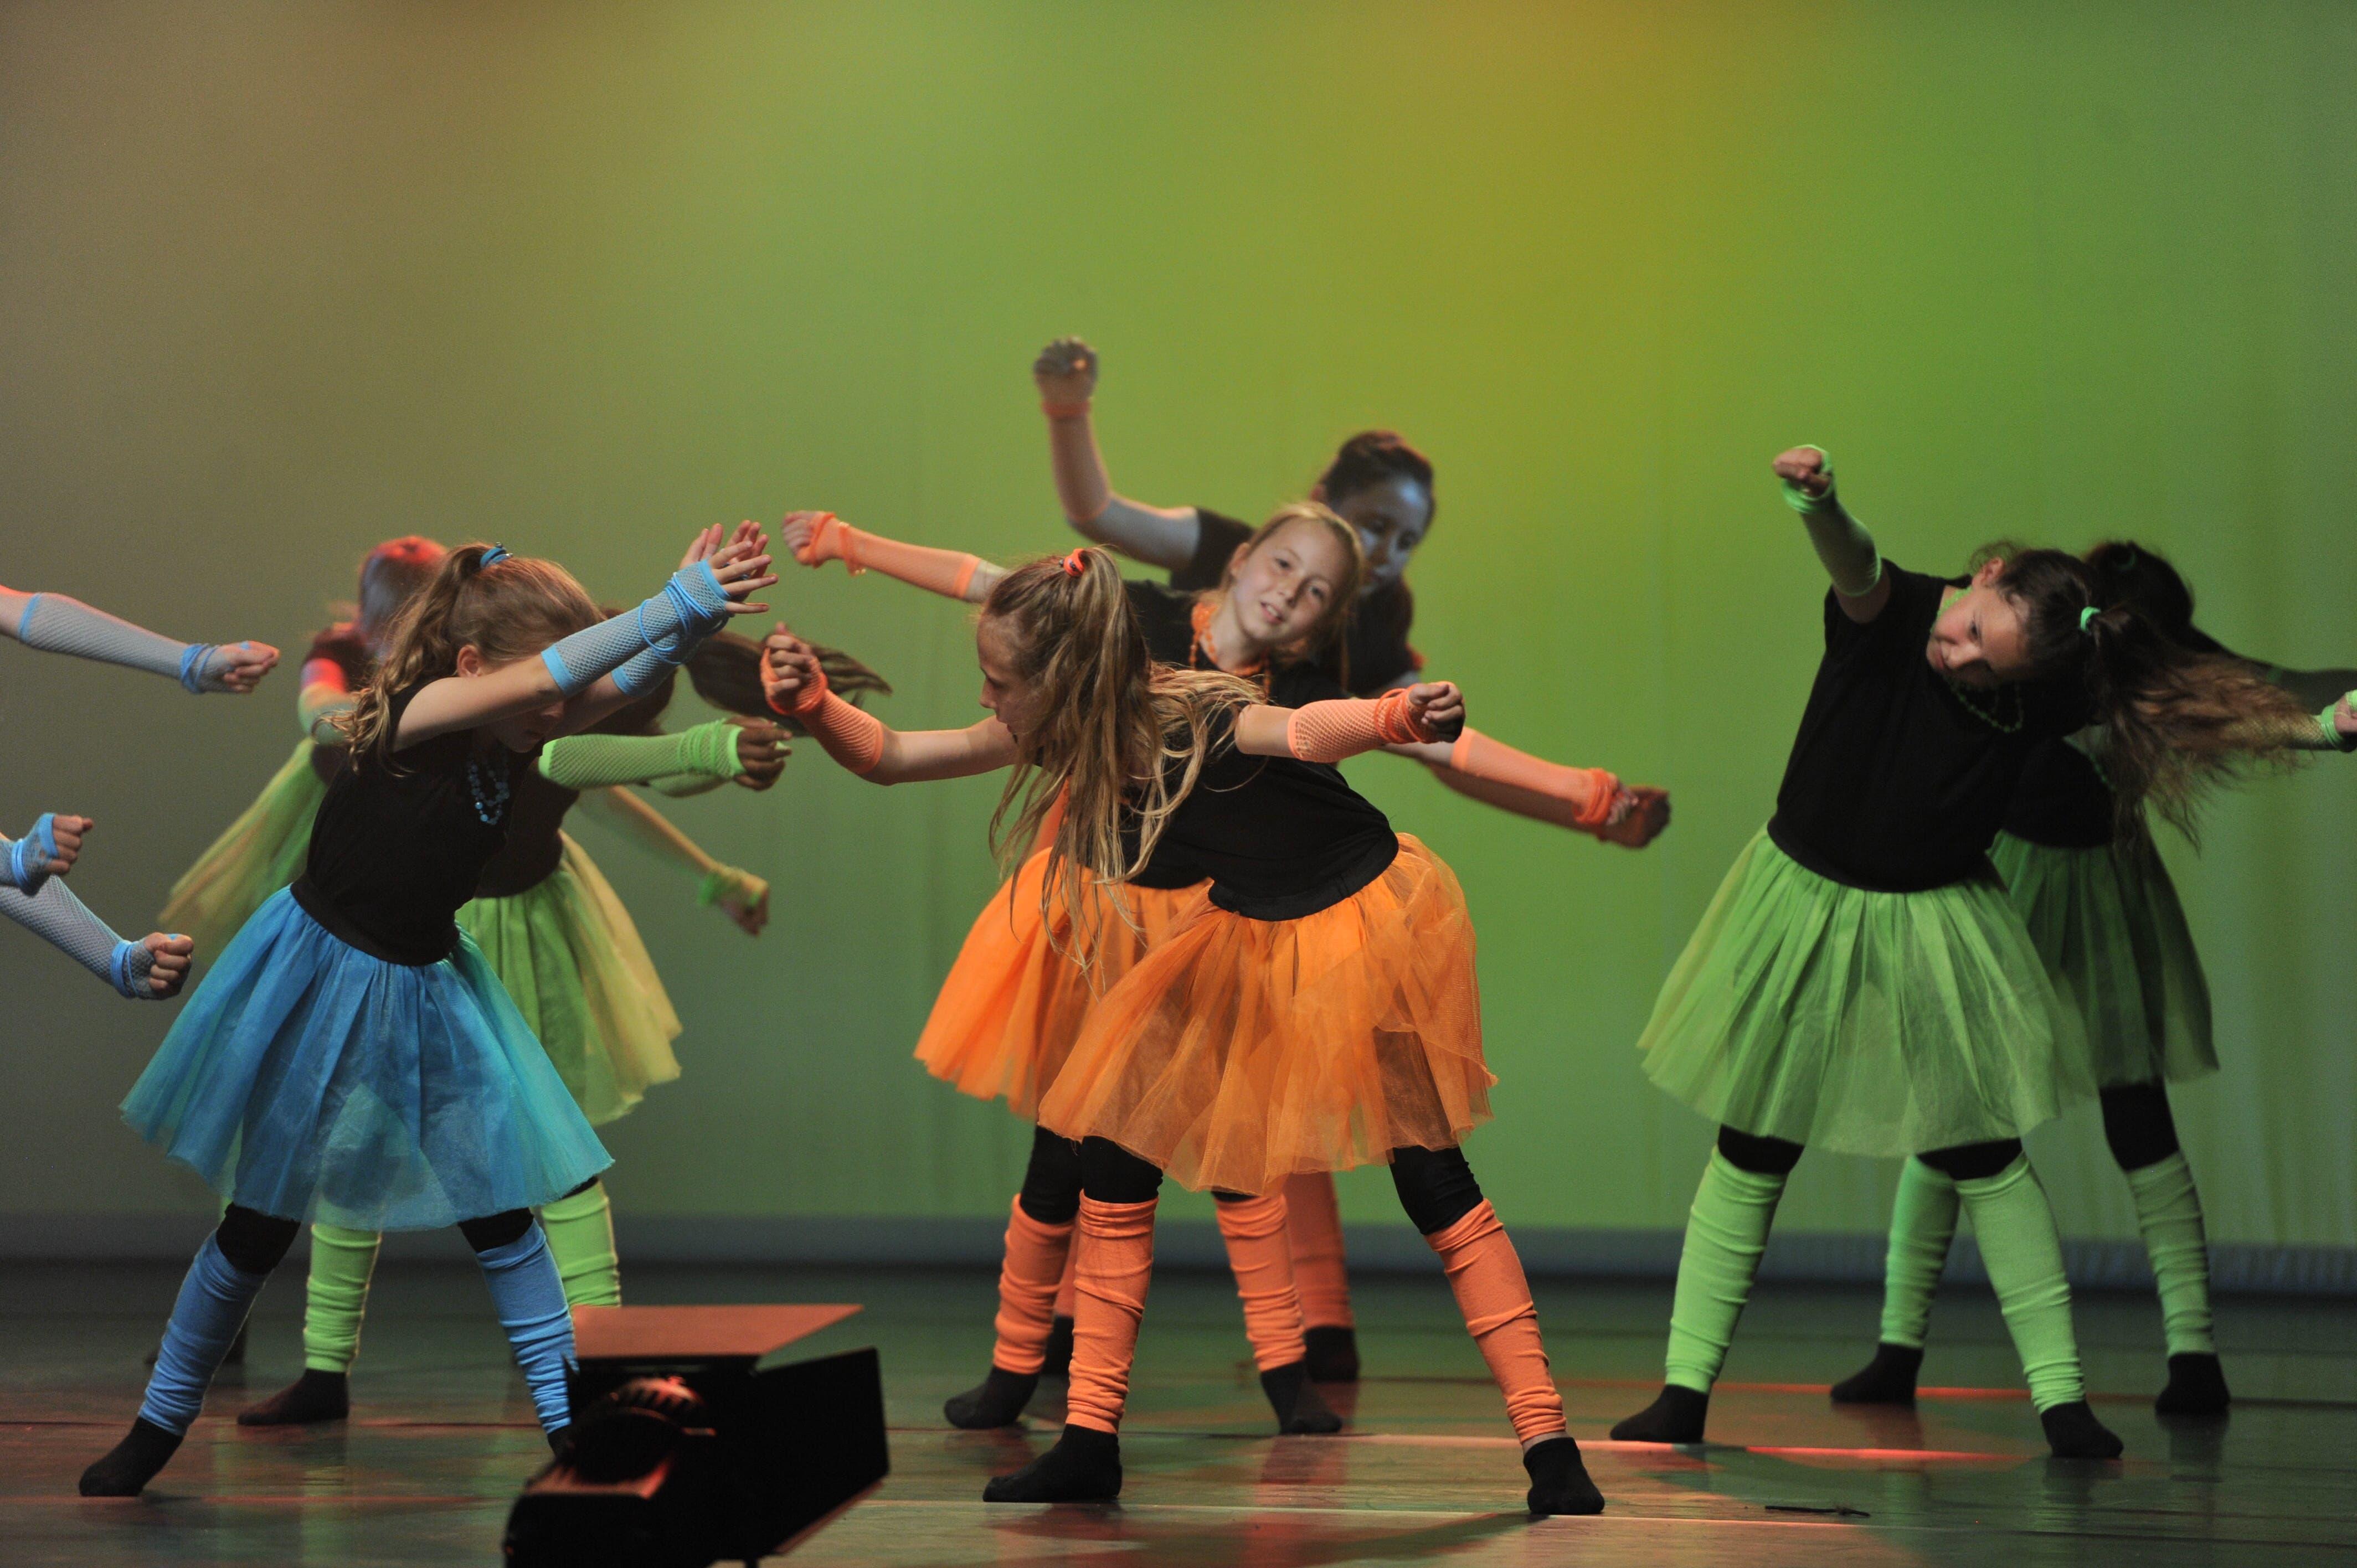 Tanzmeeting im Theater Uri in Altdorf. (Bild: Urs Hanhart)